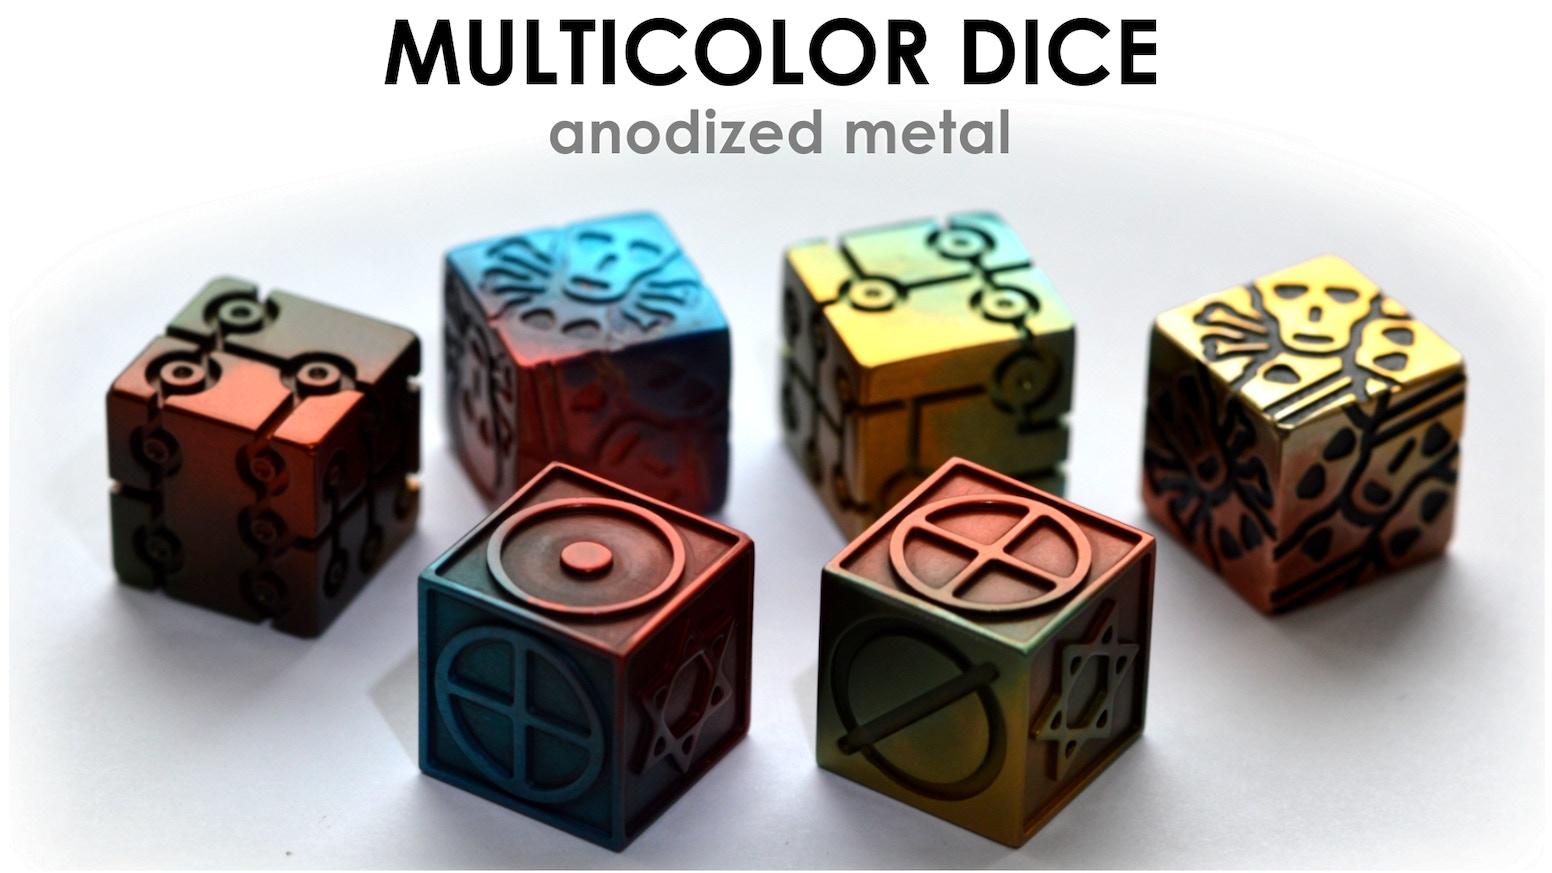 Unique Metal Design for Board Games and Collectors